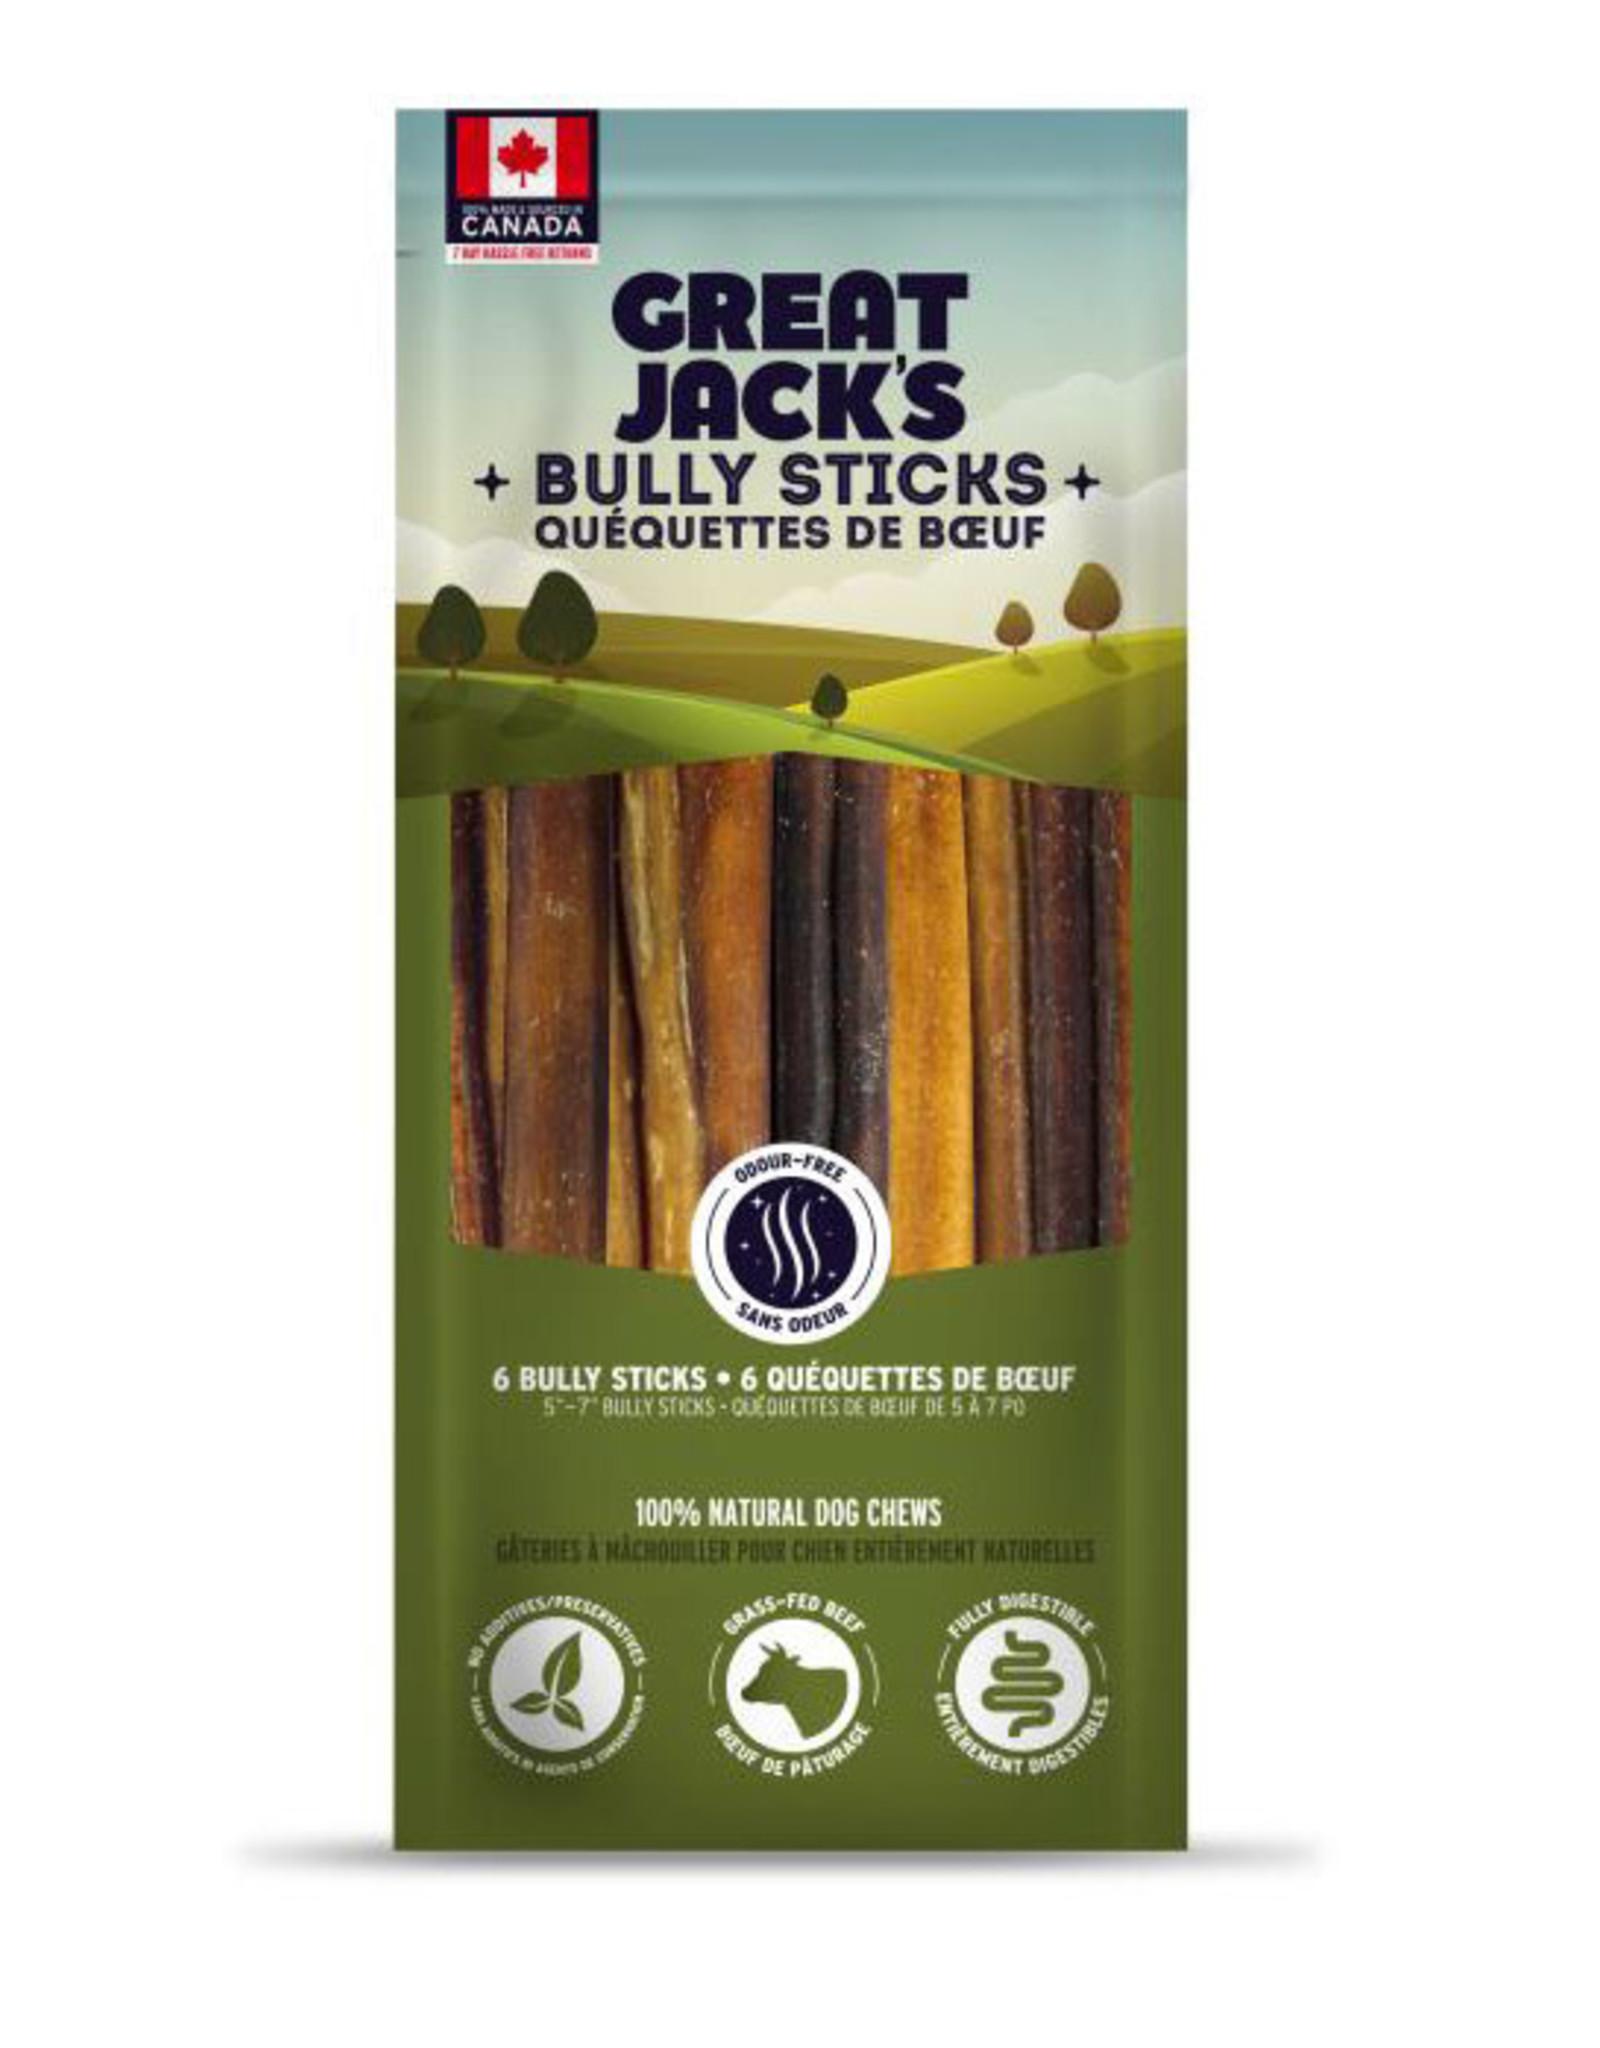 Great Jack's Great Jacks Bully Stick 5-7in 6pk